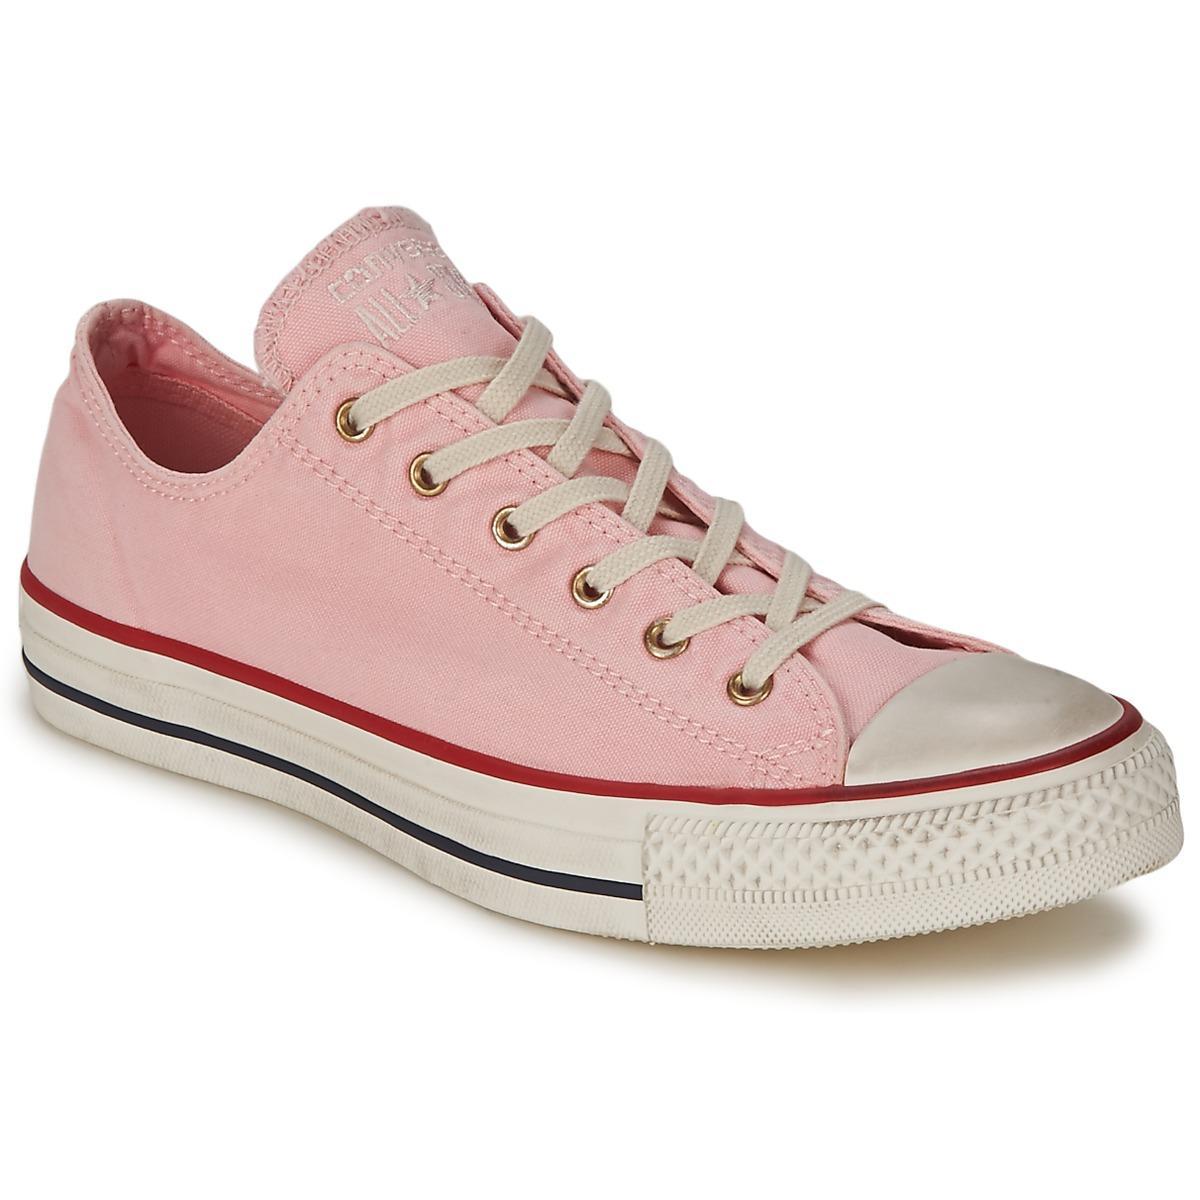 Shorts and Baby Pink Converse?